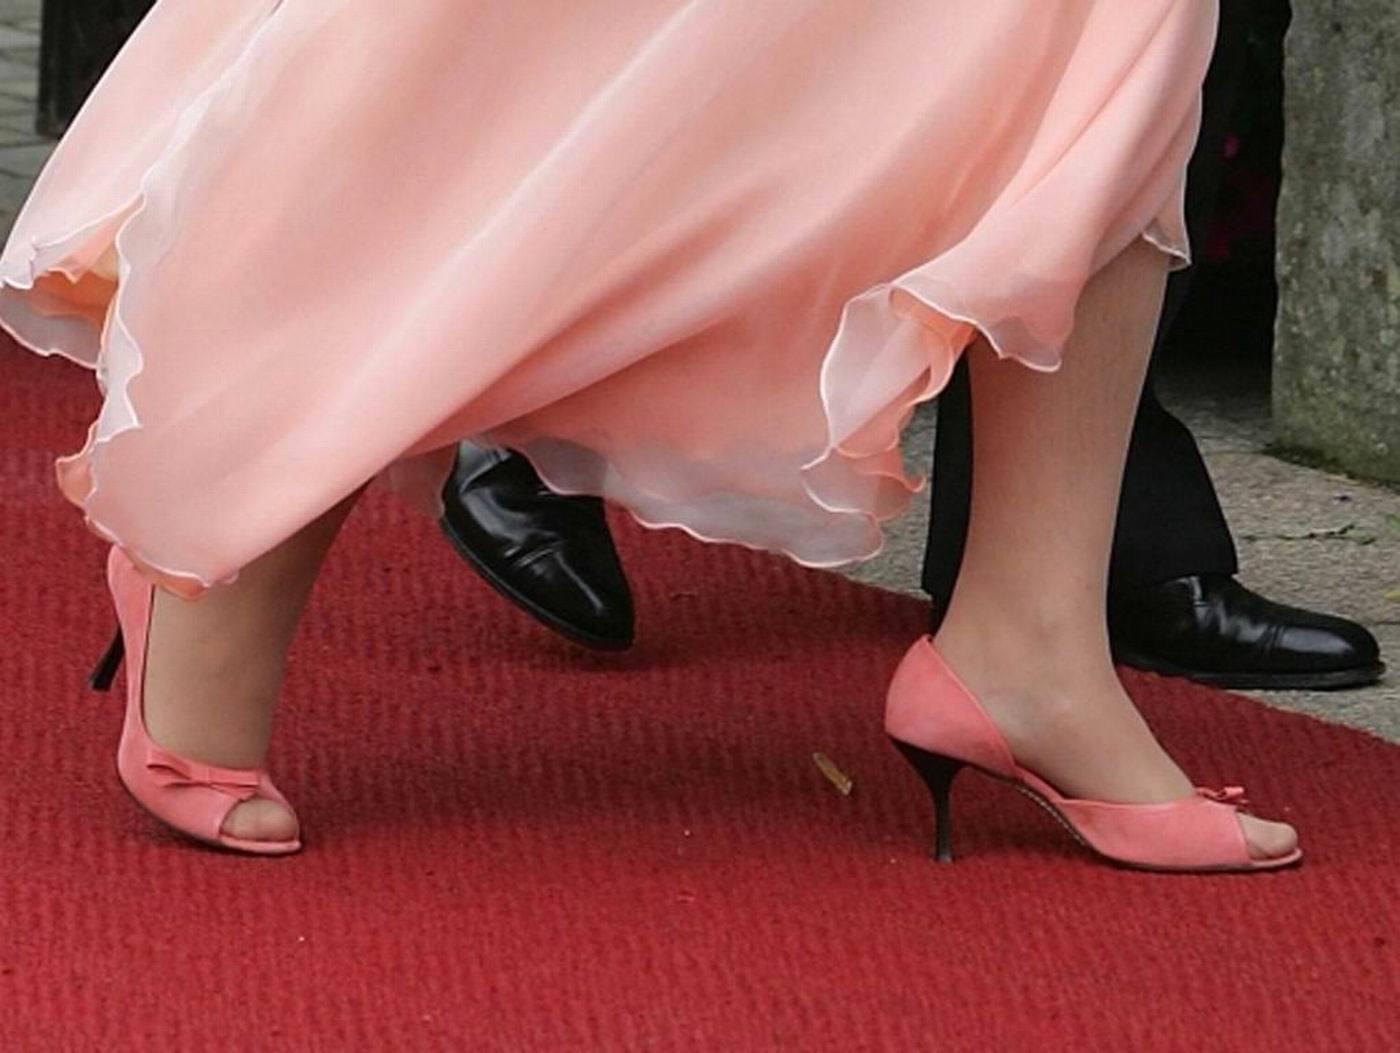 Feet Angela Merkel nude (18 photo), Sexy, Paparazzi, Selfie, cameltoe 2017